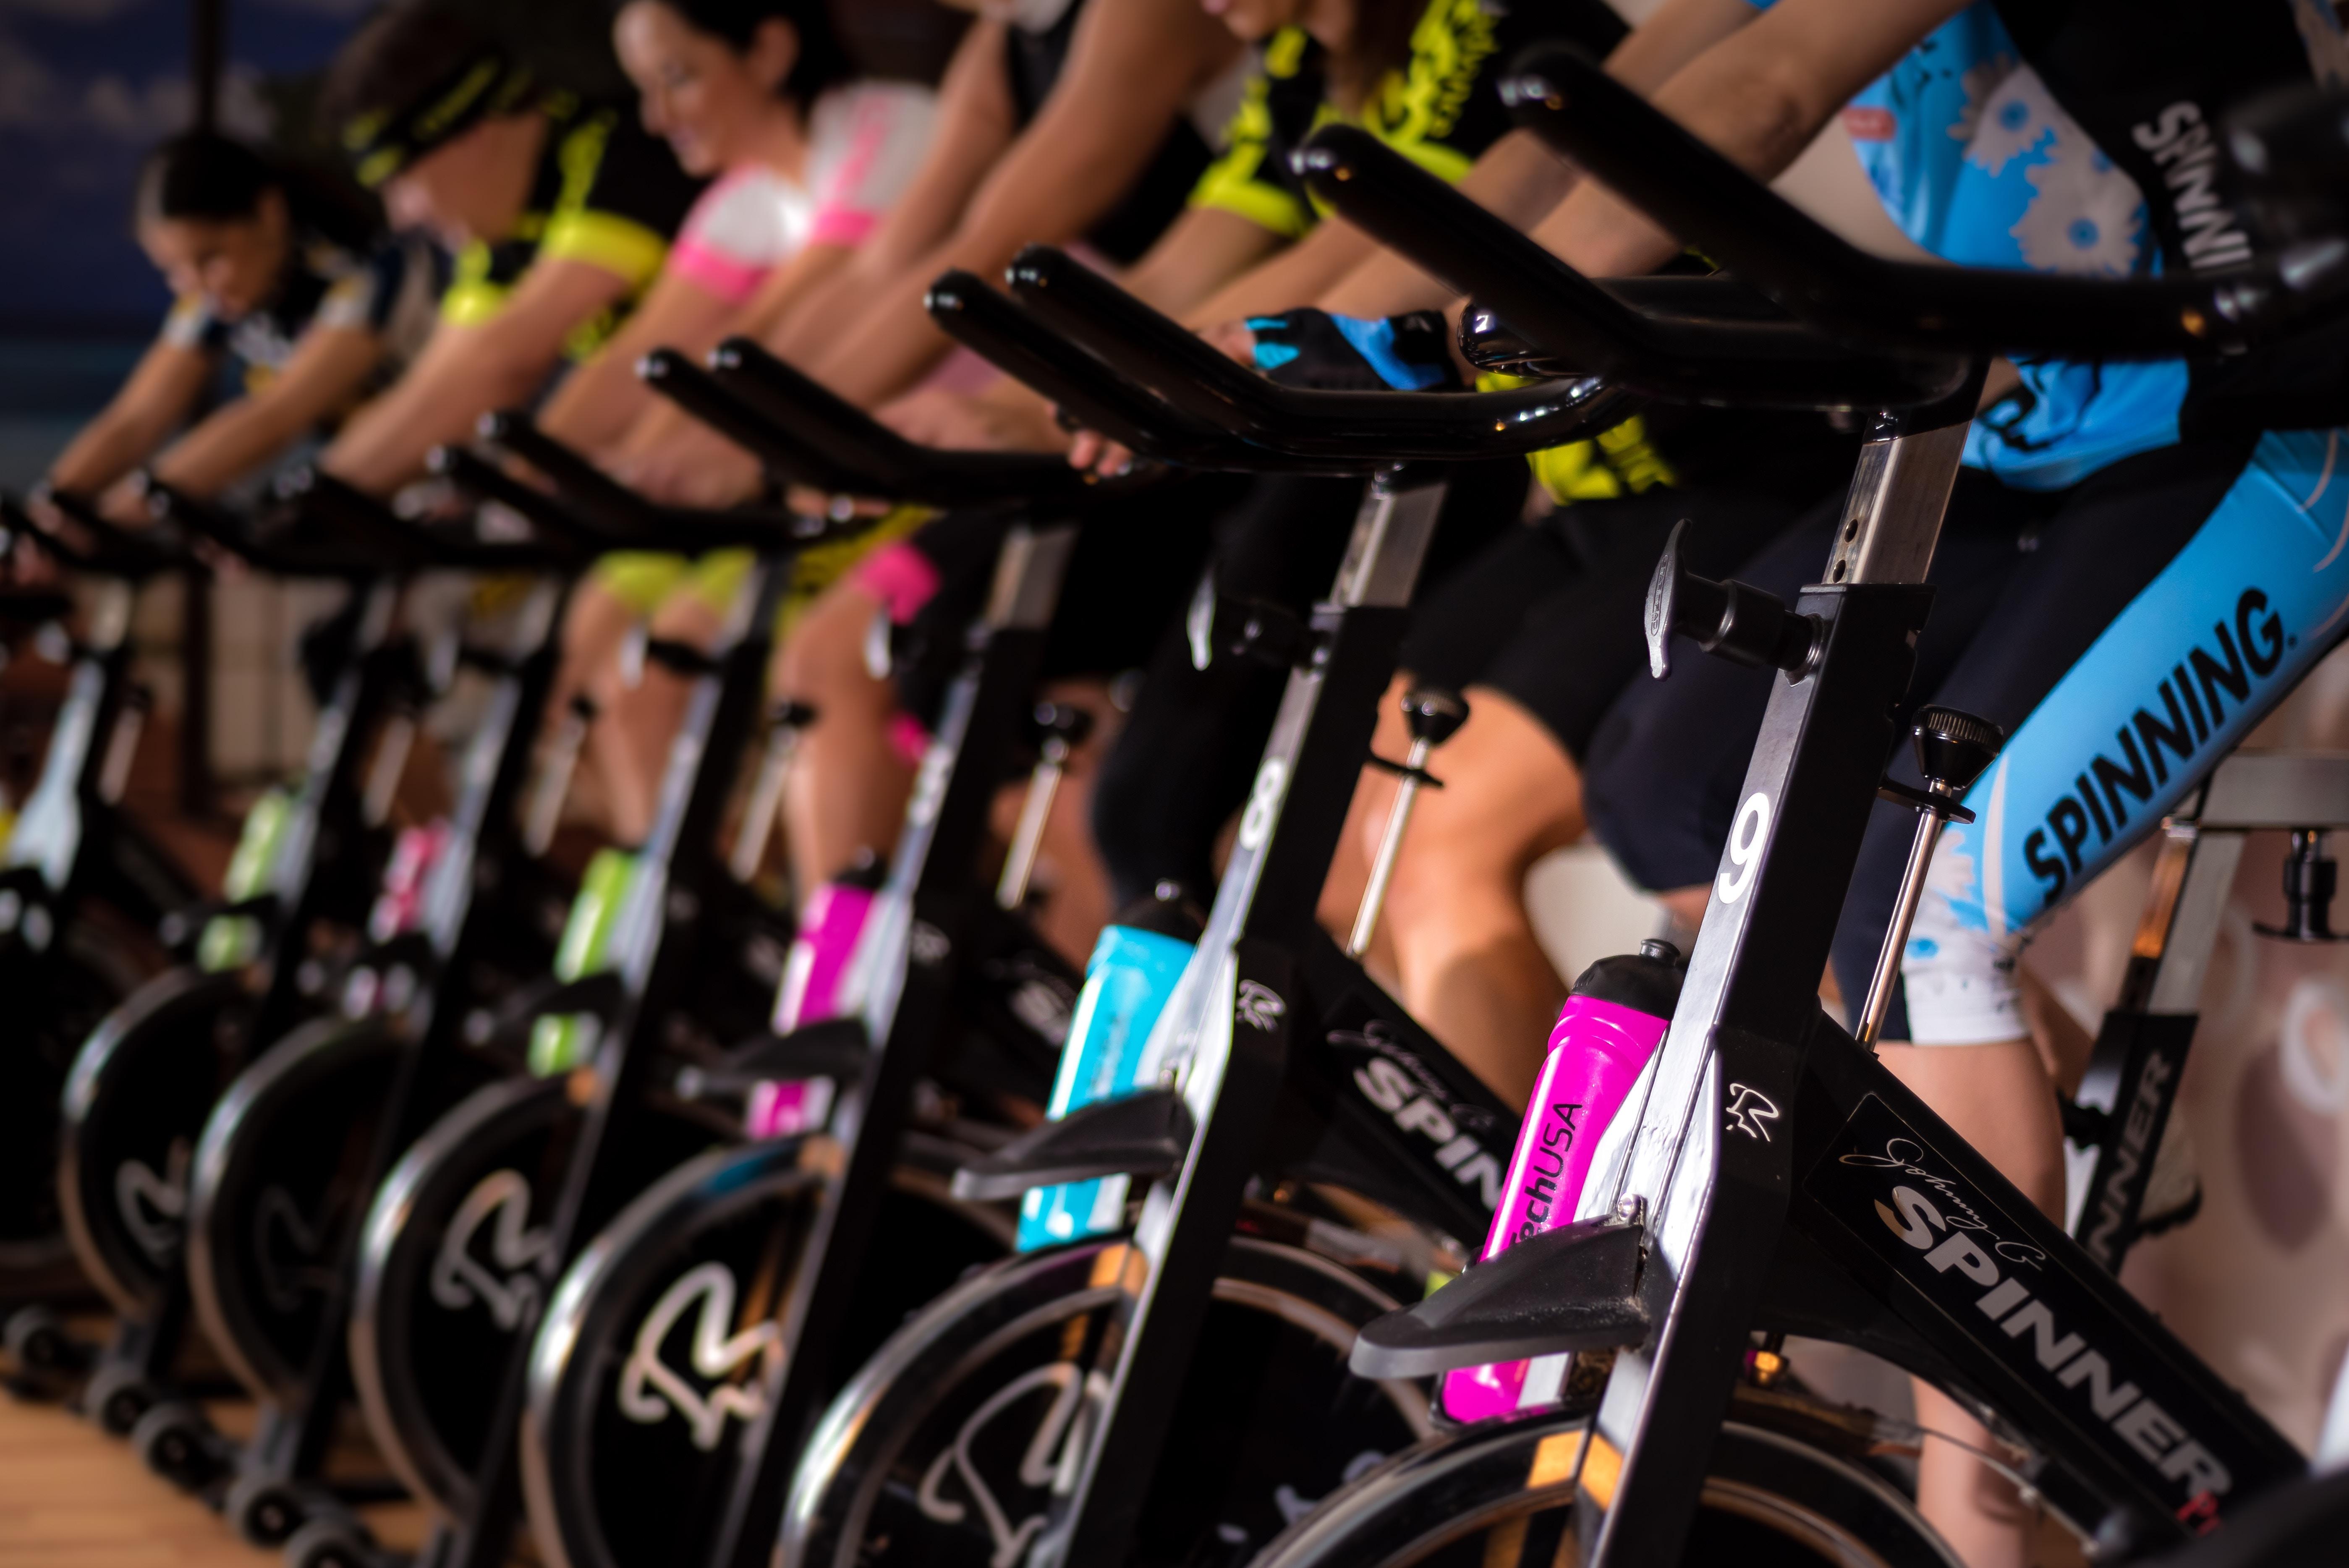 Sprint Interval Training: dimagrire velocemente con la cyclette